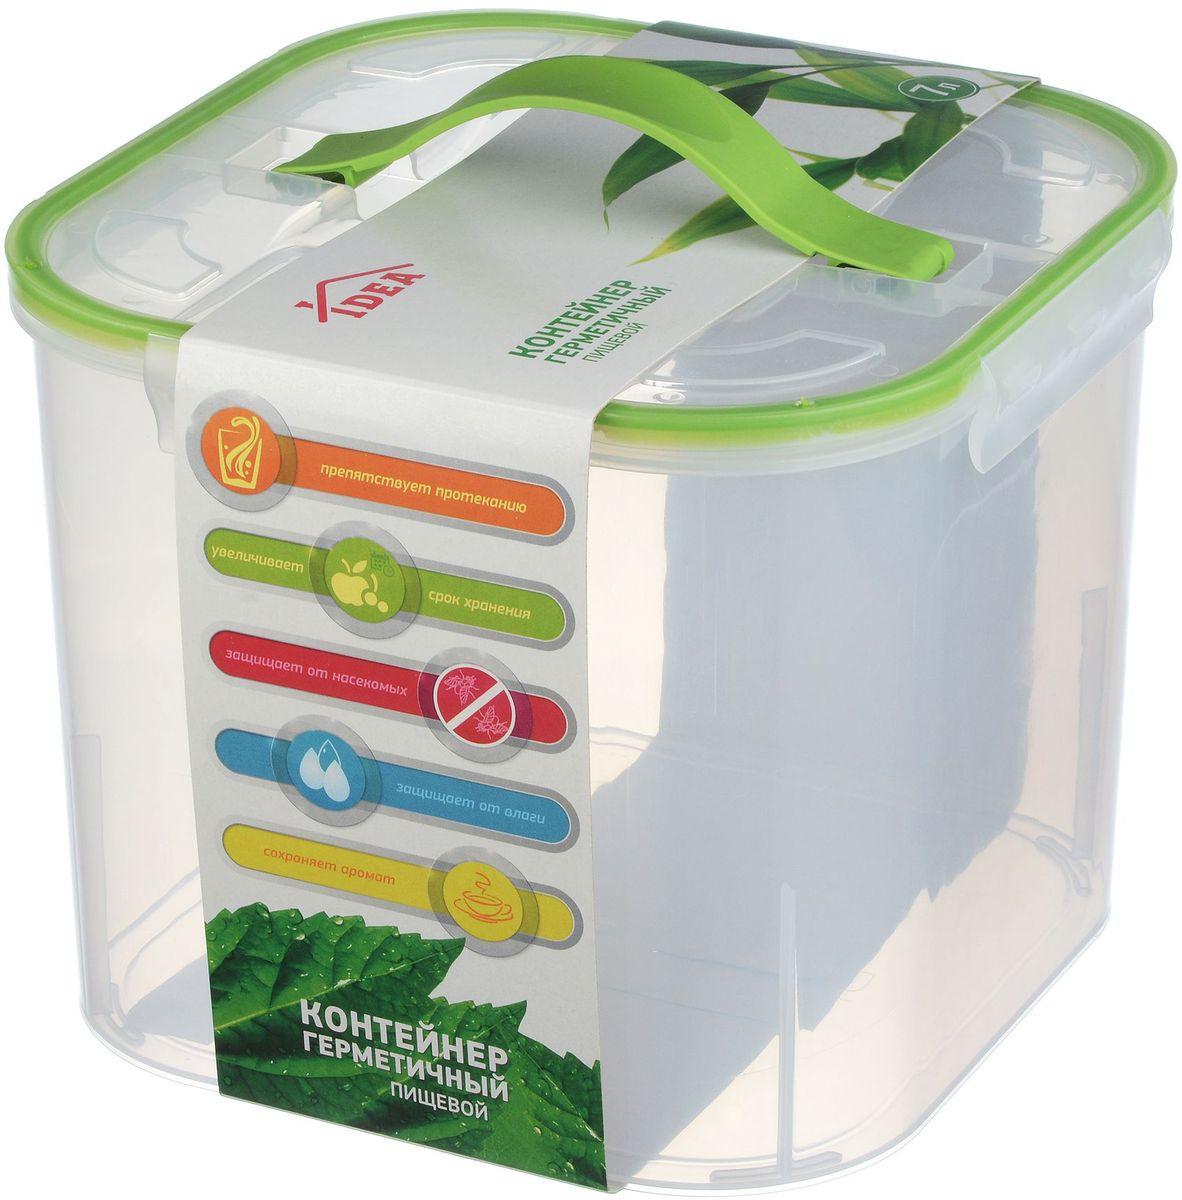 Контейнер для хранения Idea, цвет: прозрачный, 23 х 23 х 18 см контейнер giaretti цвет кремовый прозрачный 29 2 х 17 х 11 см